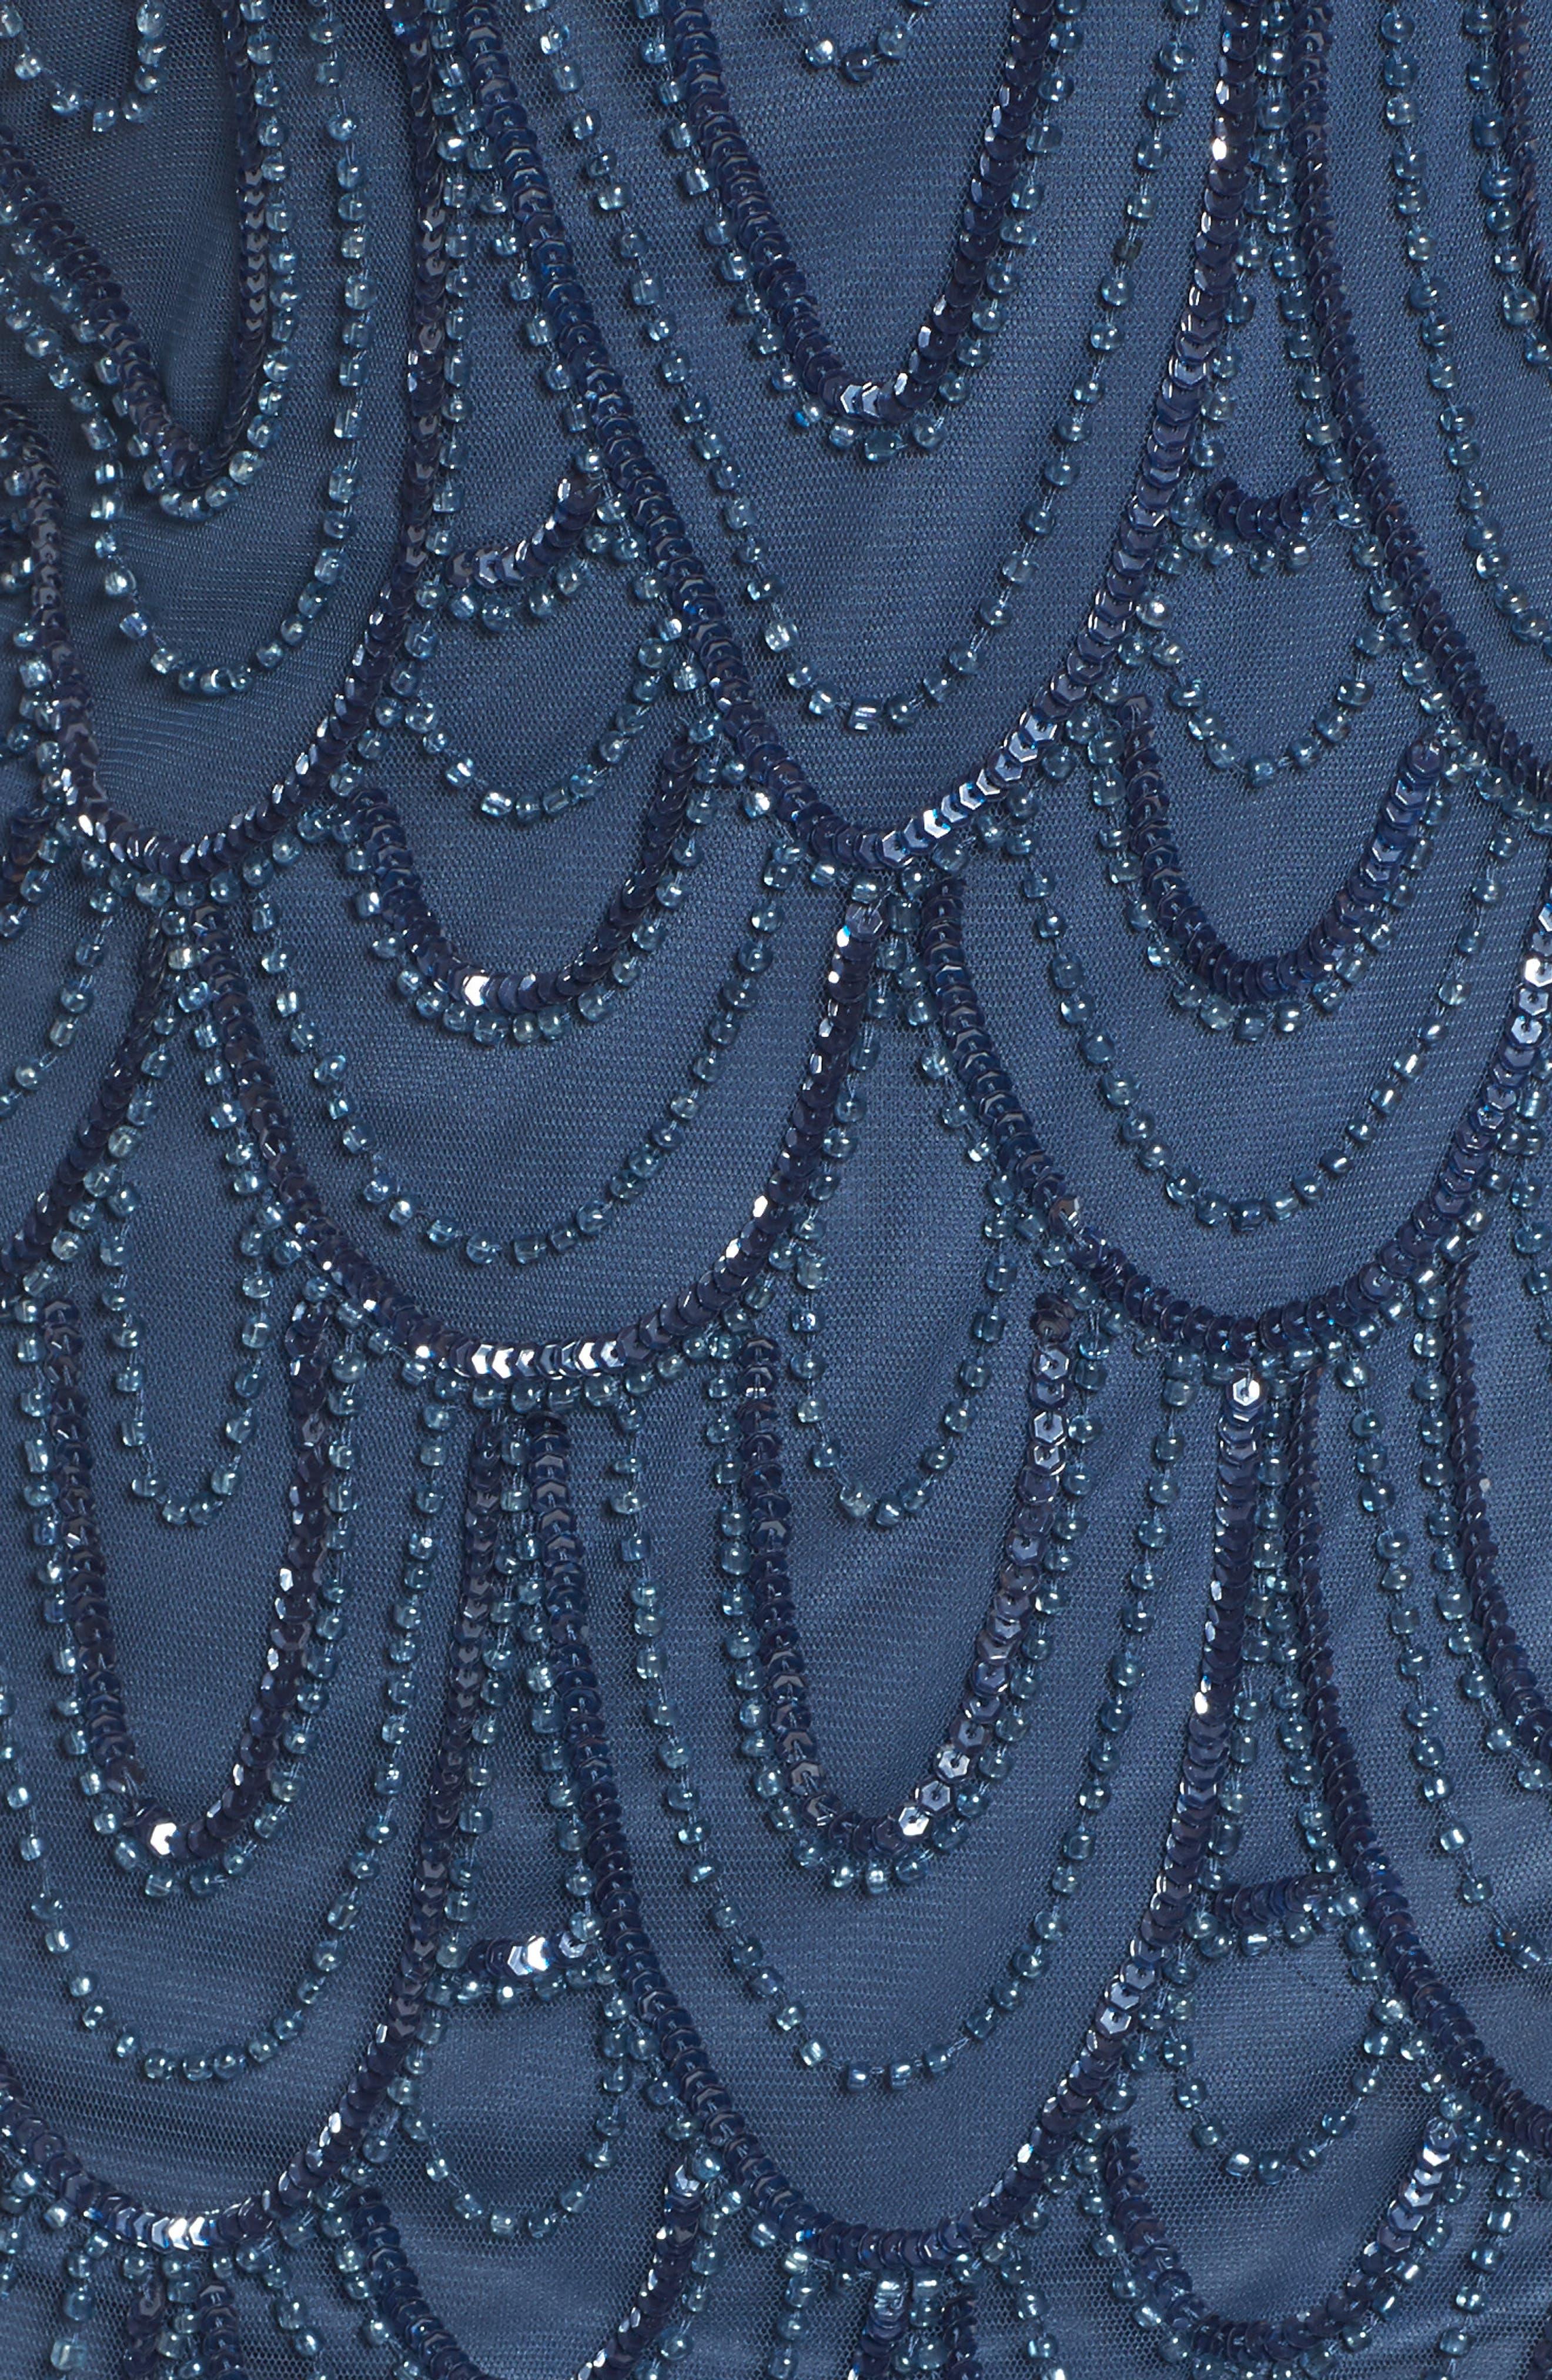 Embellished Mesh Sheath Dress,                             Alternate thumbnail 80, color,